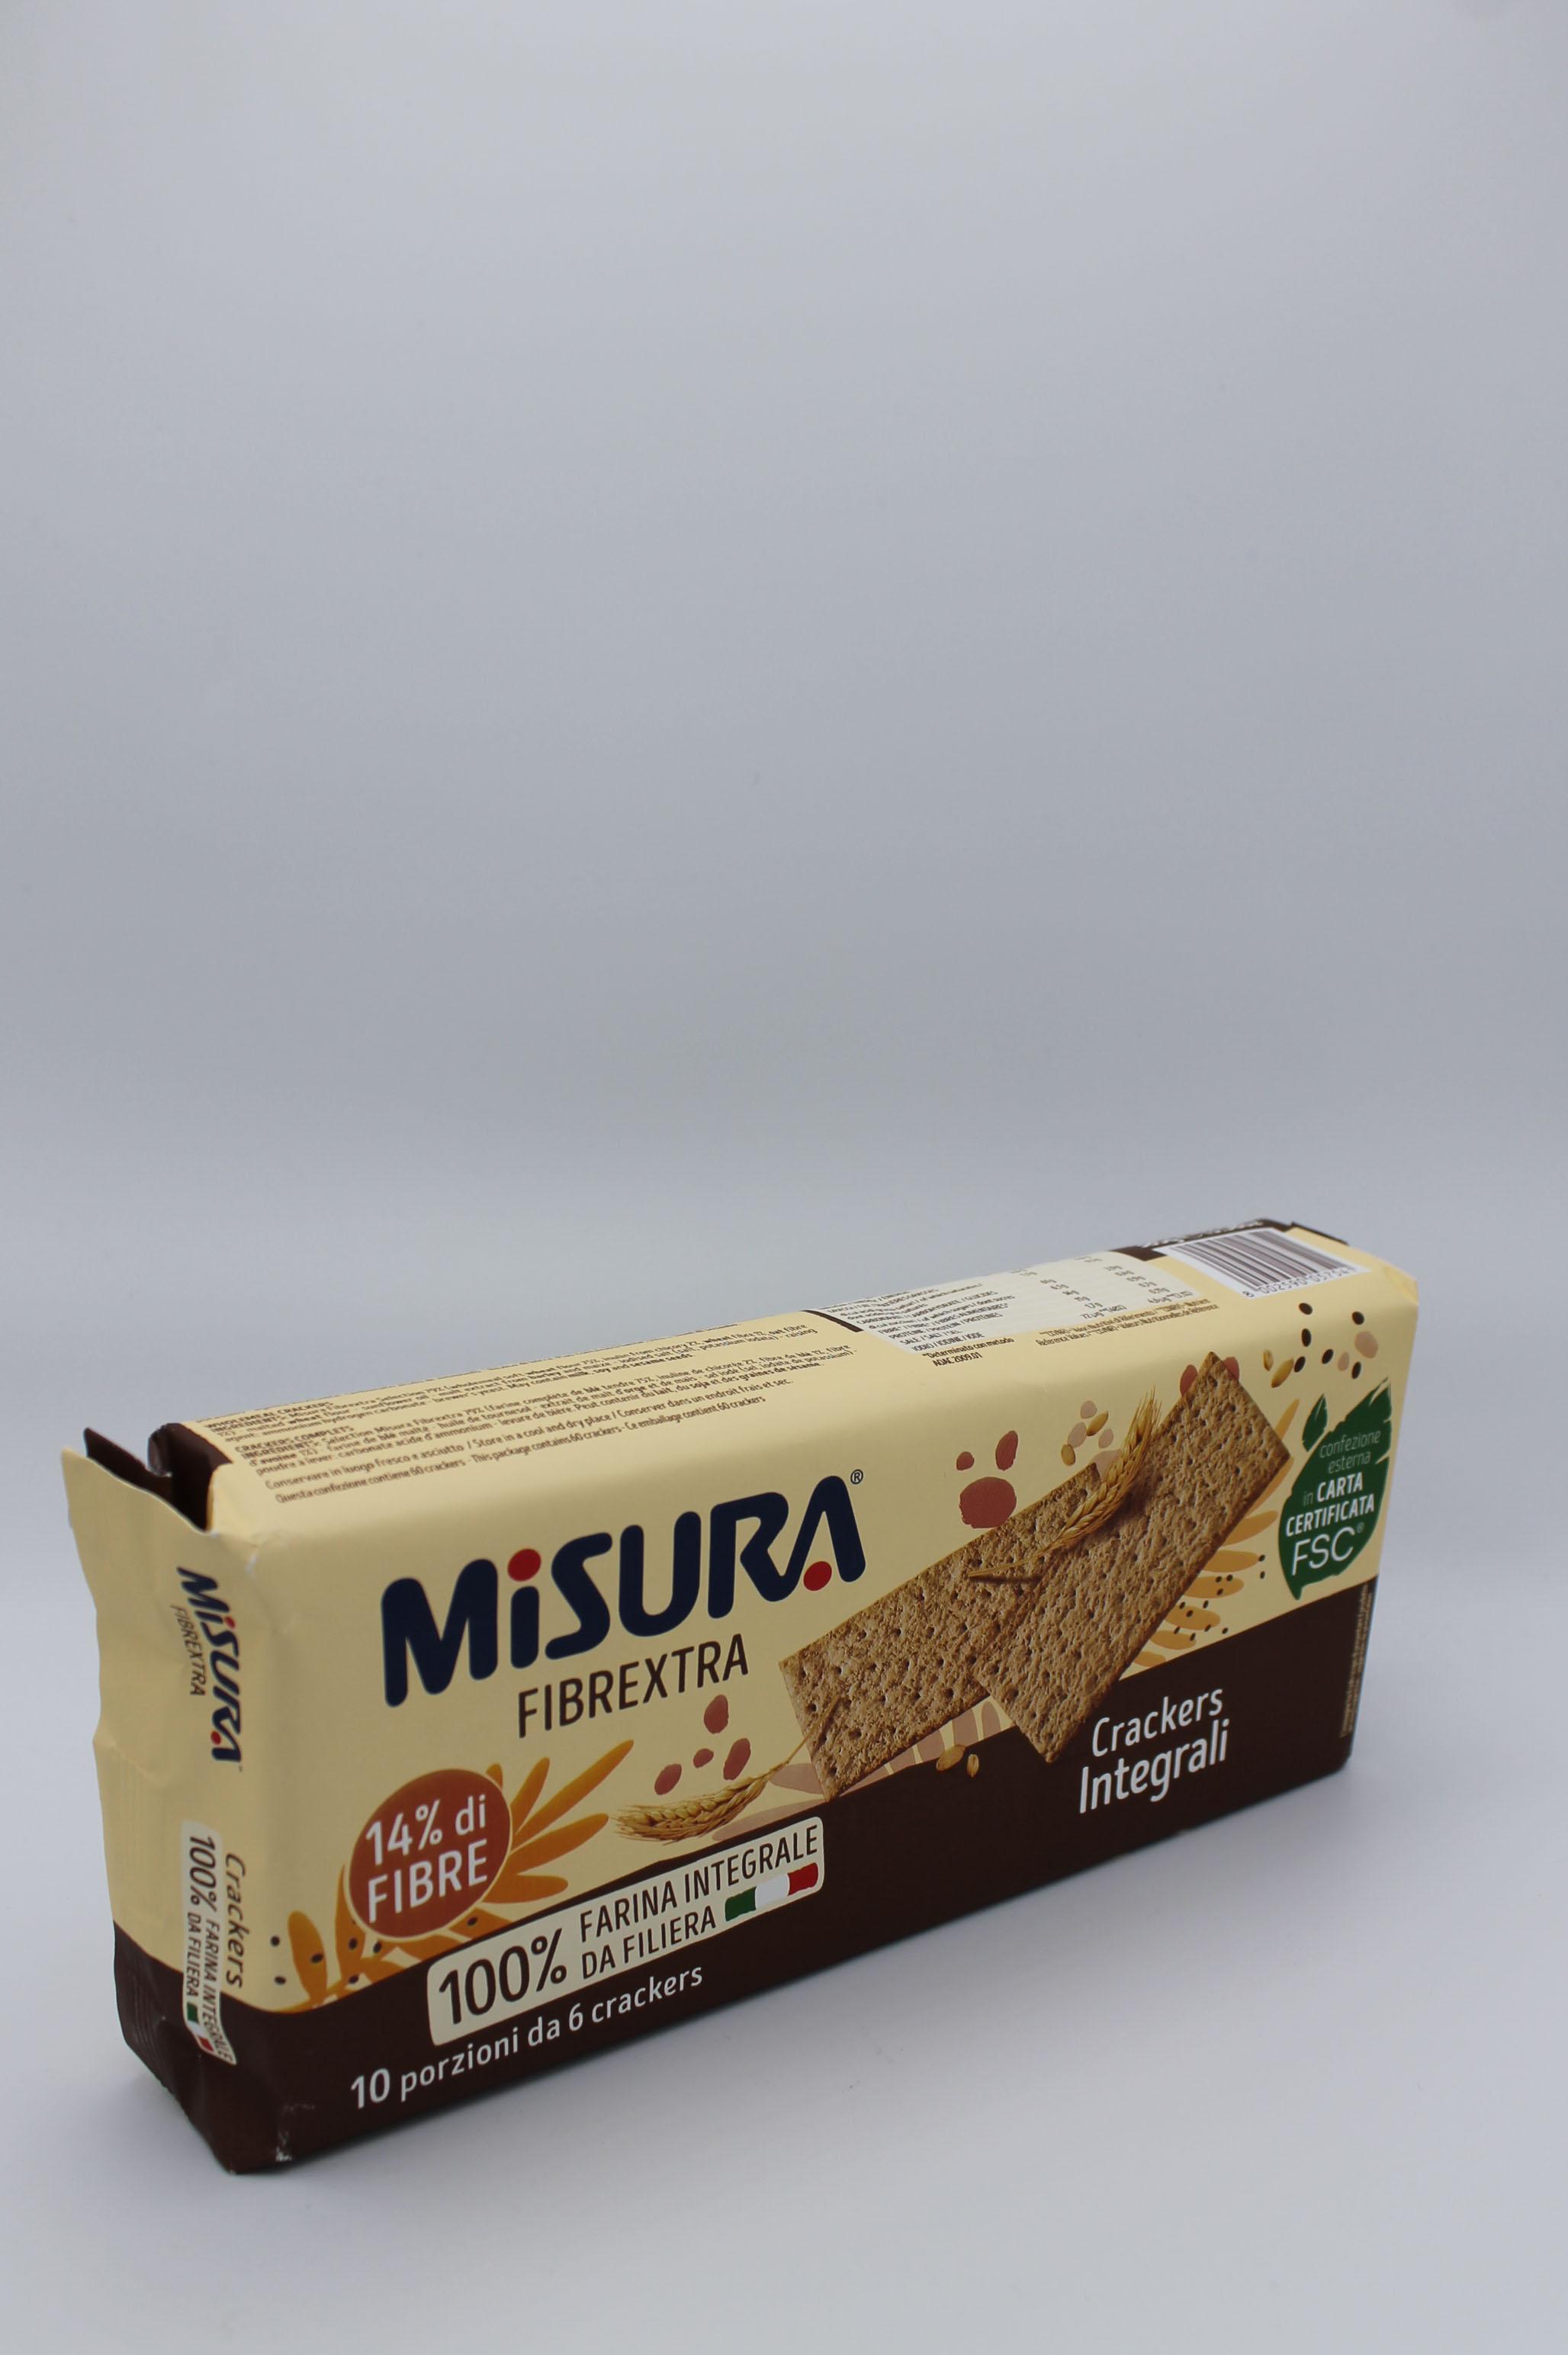 Misura crackers integrali 385 gr.